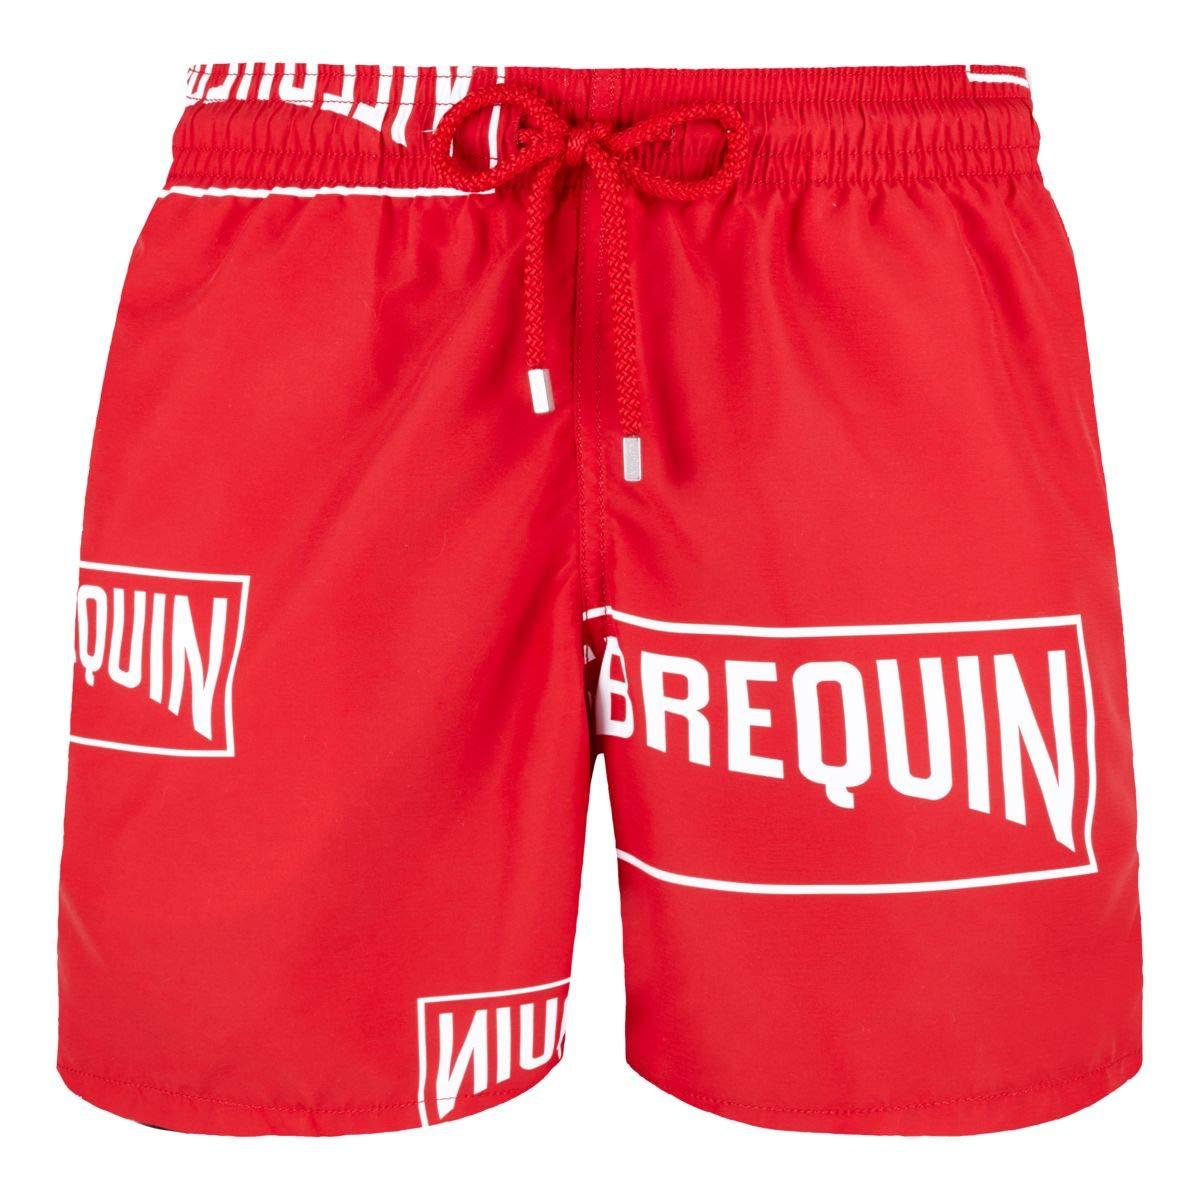 a90f4c4b74041 Vilebrequin Men's Collaboration Swimtrunks at Amazon Men's Clothing store: